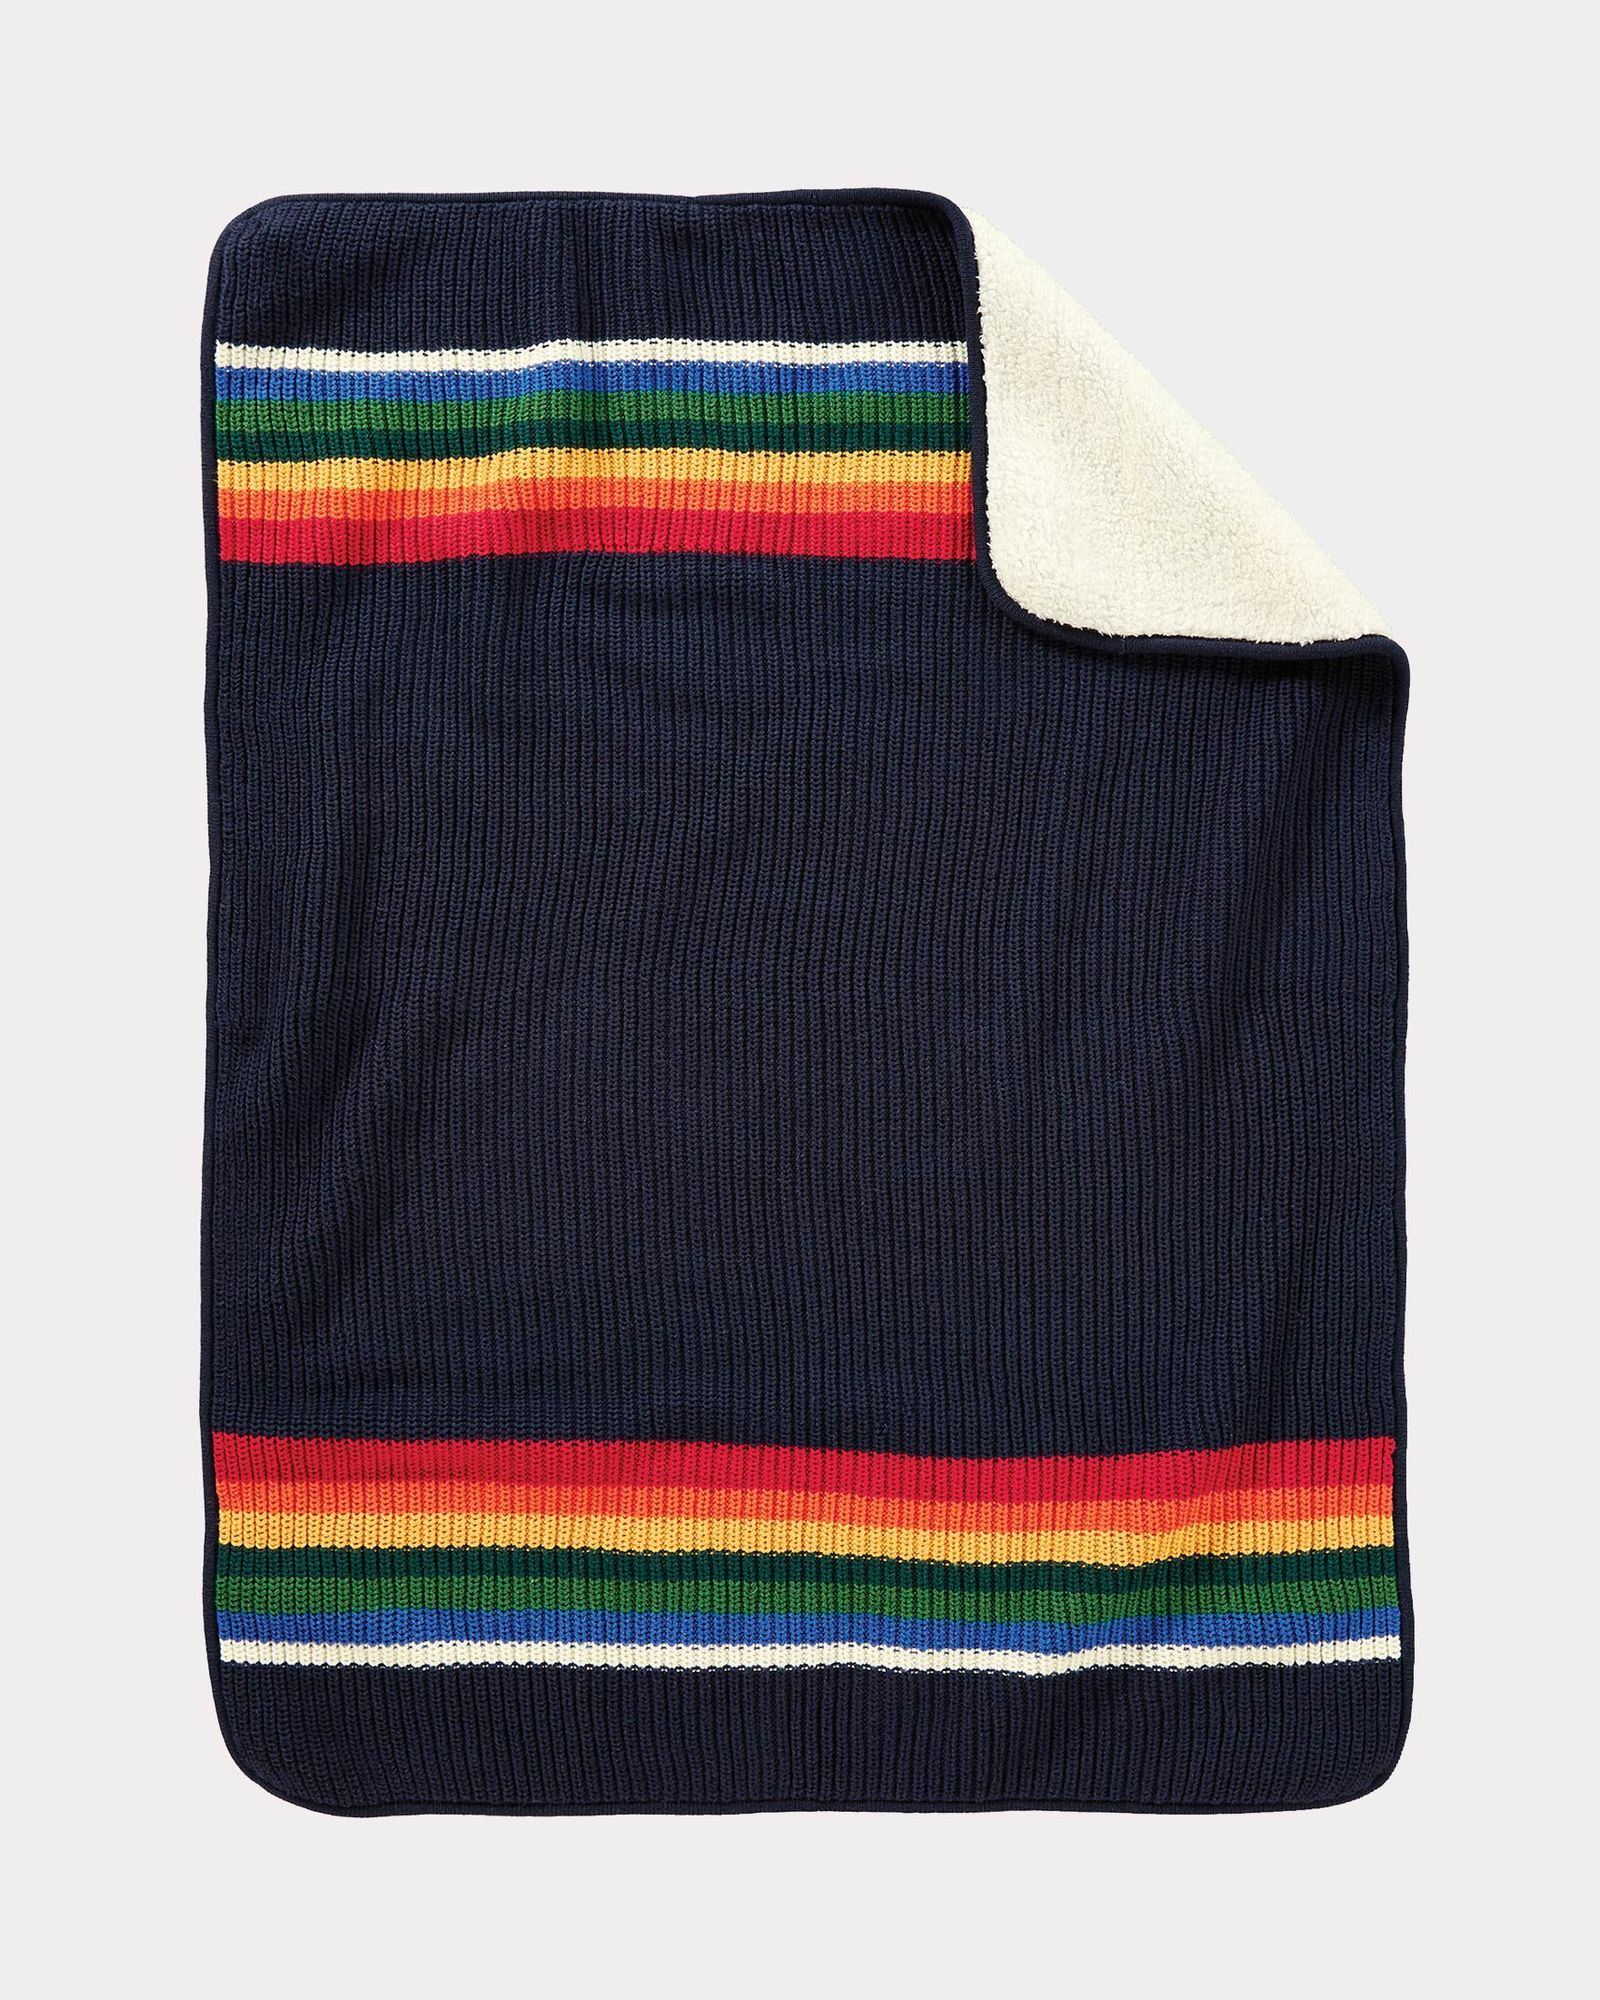 crater lake sherpa stroller blanket. Stroller blanket